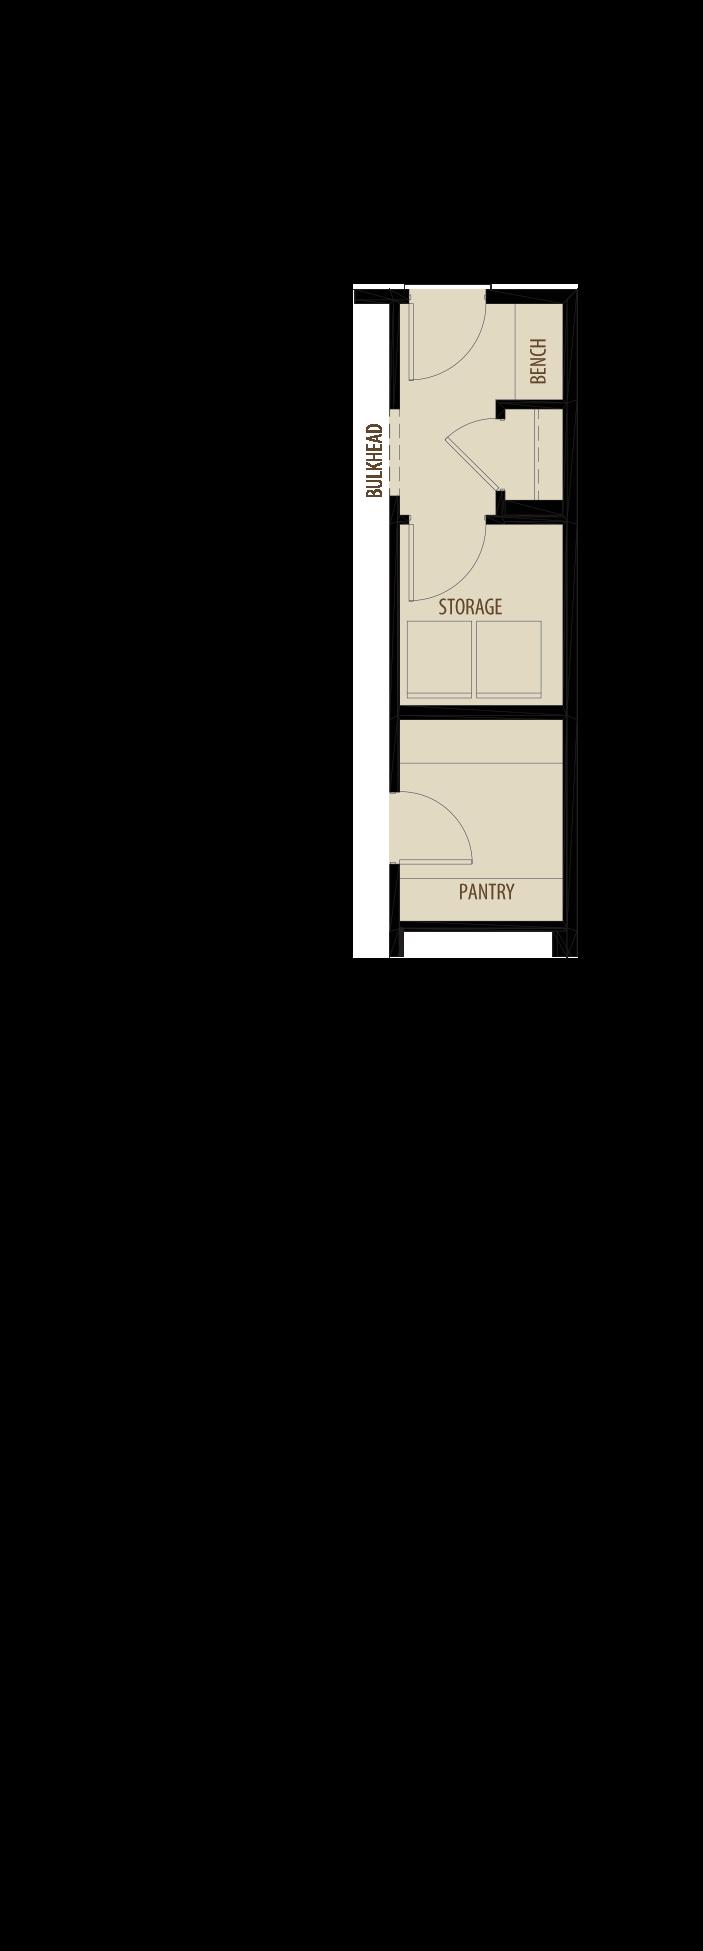 Optional Rear Entry